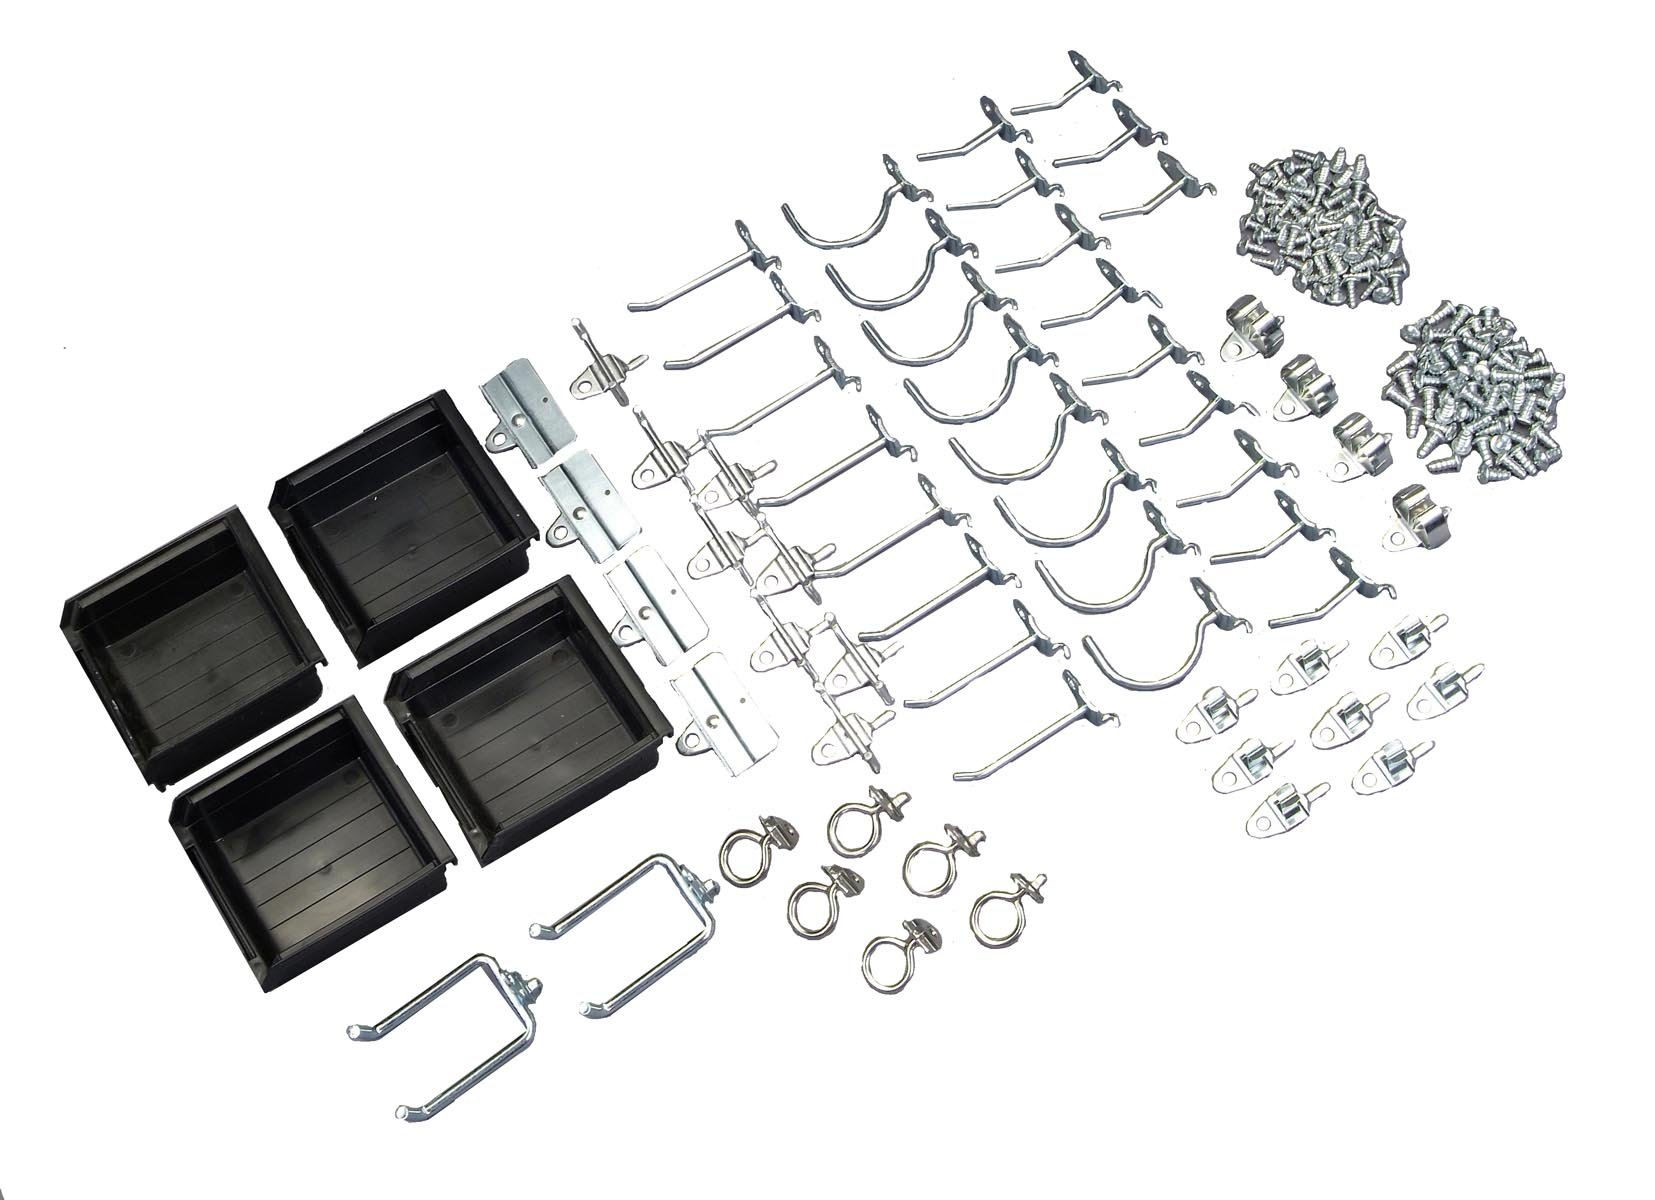 Triton Products 76964 DuraHook and Hanging Bin Assortment Kit